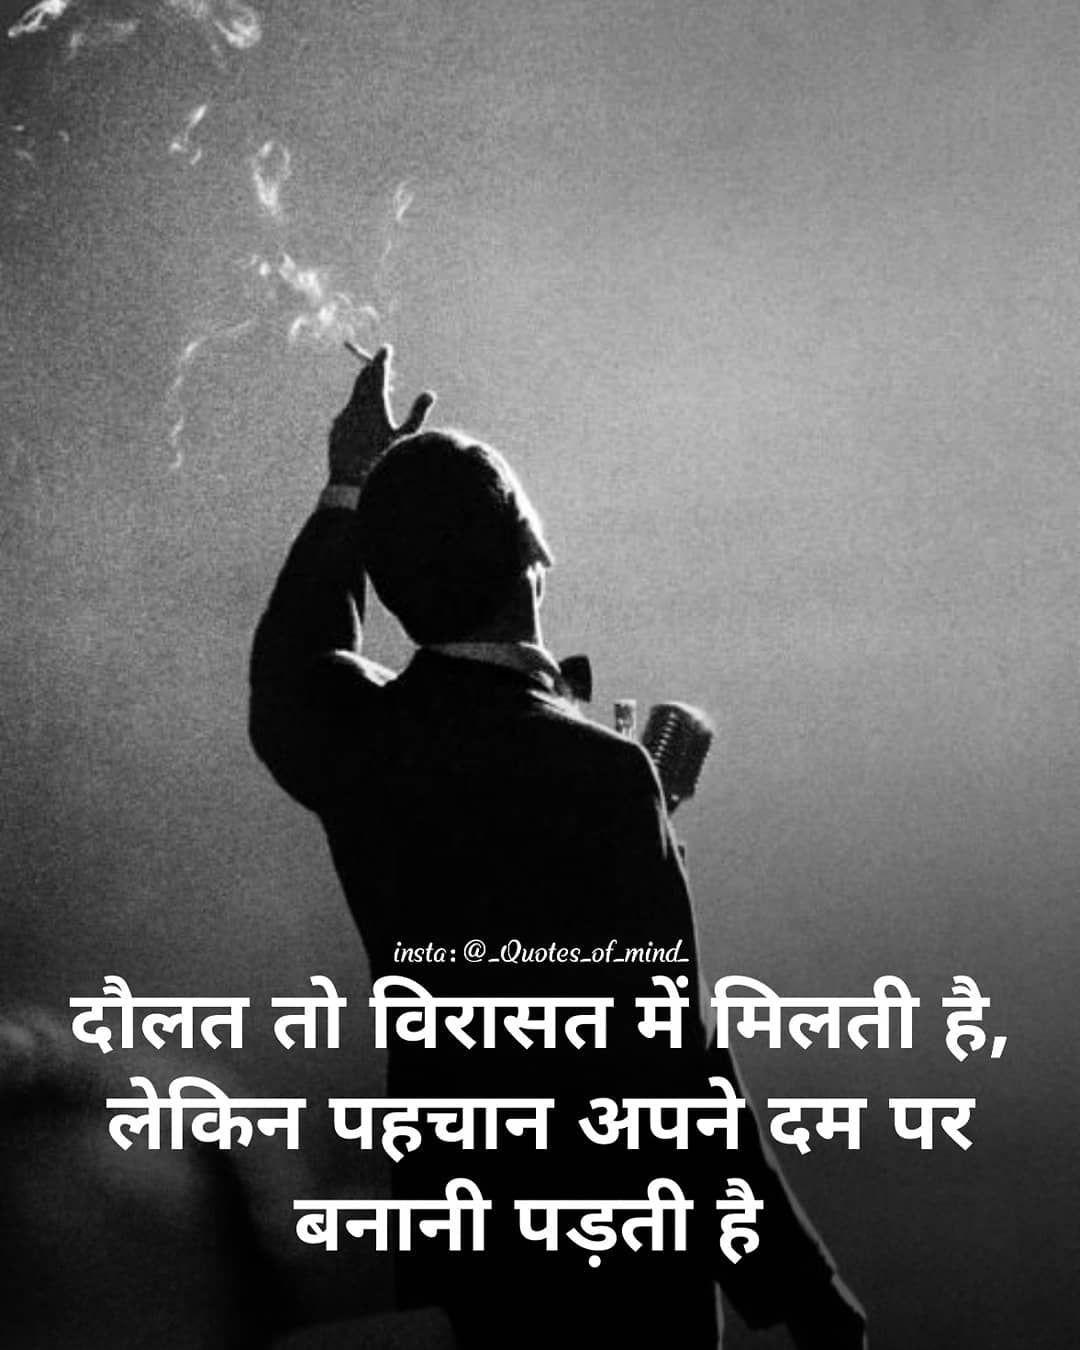 hindi motivational quotes, inspirational quotes in hindi